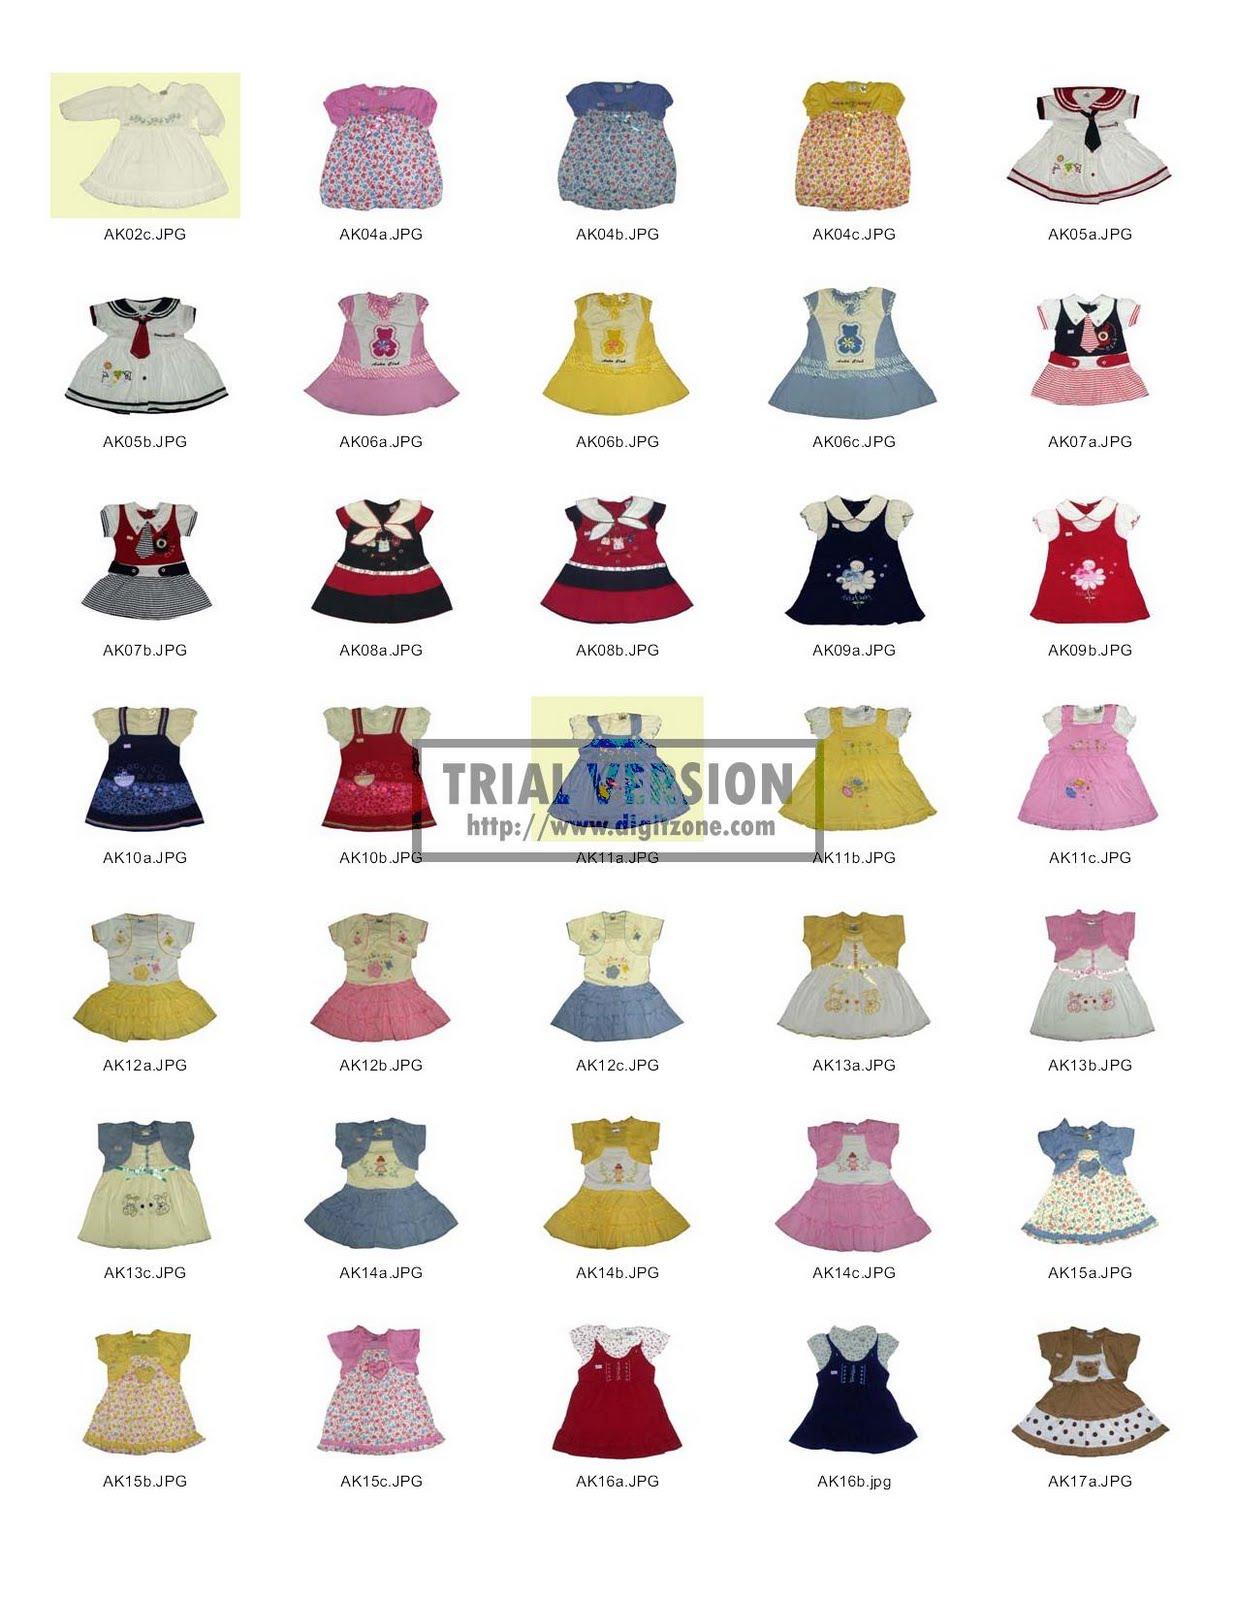 Aneka Baju Bayi dan Anak-Anak